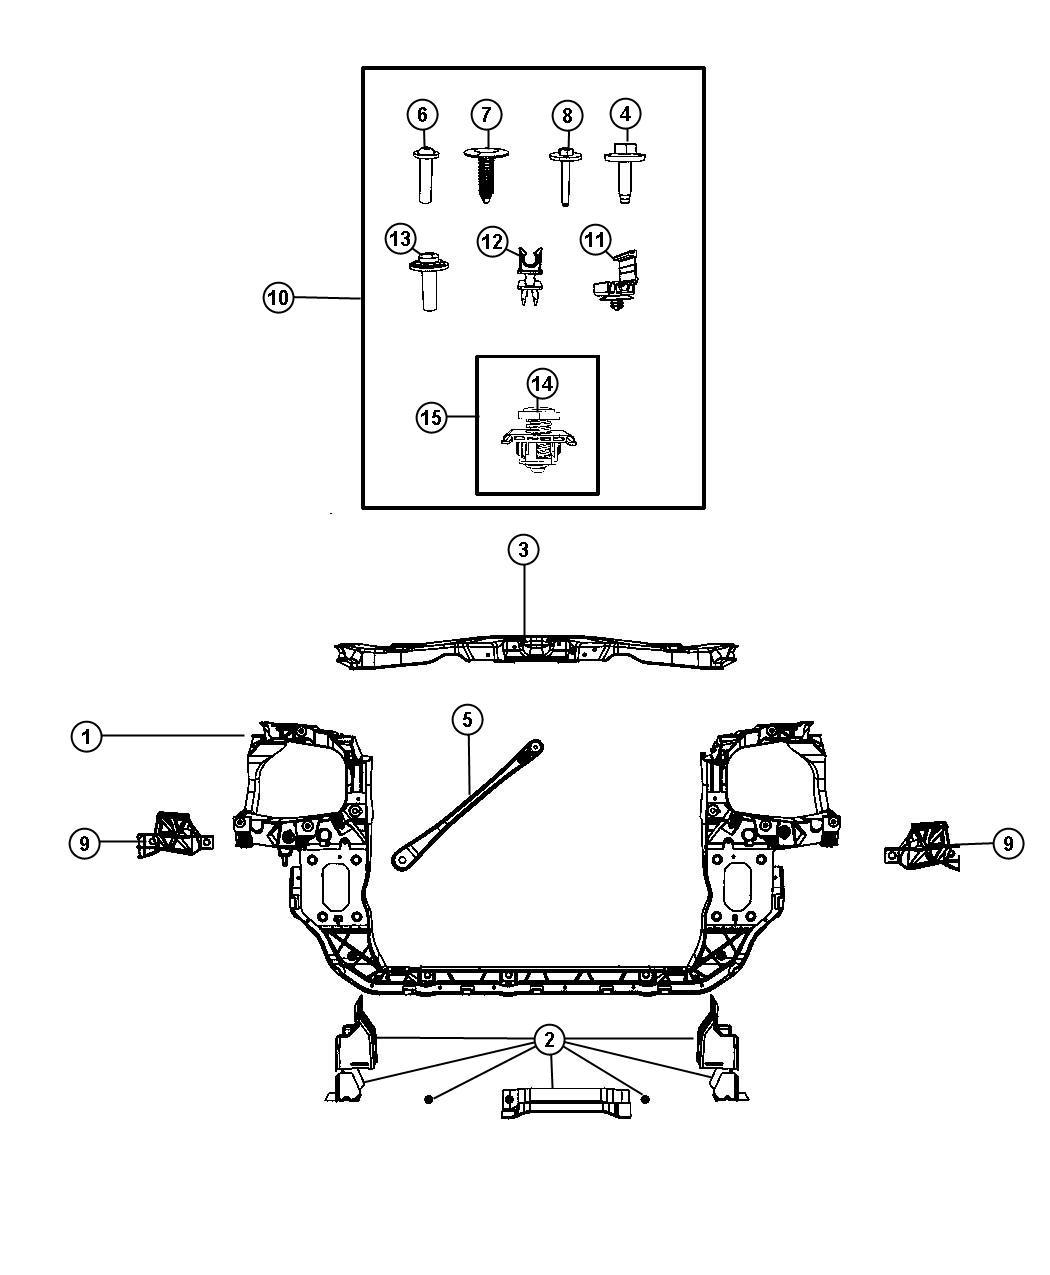 Marvelous 2007 Dodge Nitro Radiator Diagram Auto Electrical Wiring Diagram Wiring Cloud Loplapiotaidewilluminateatxorg